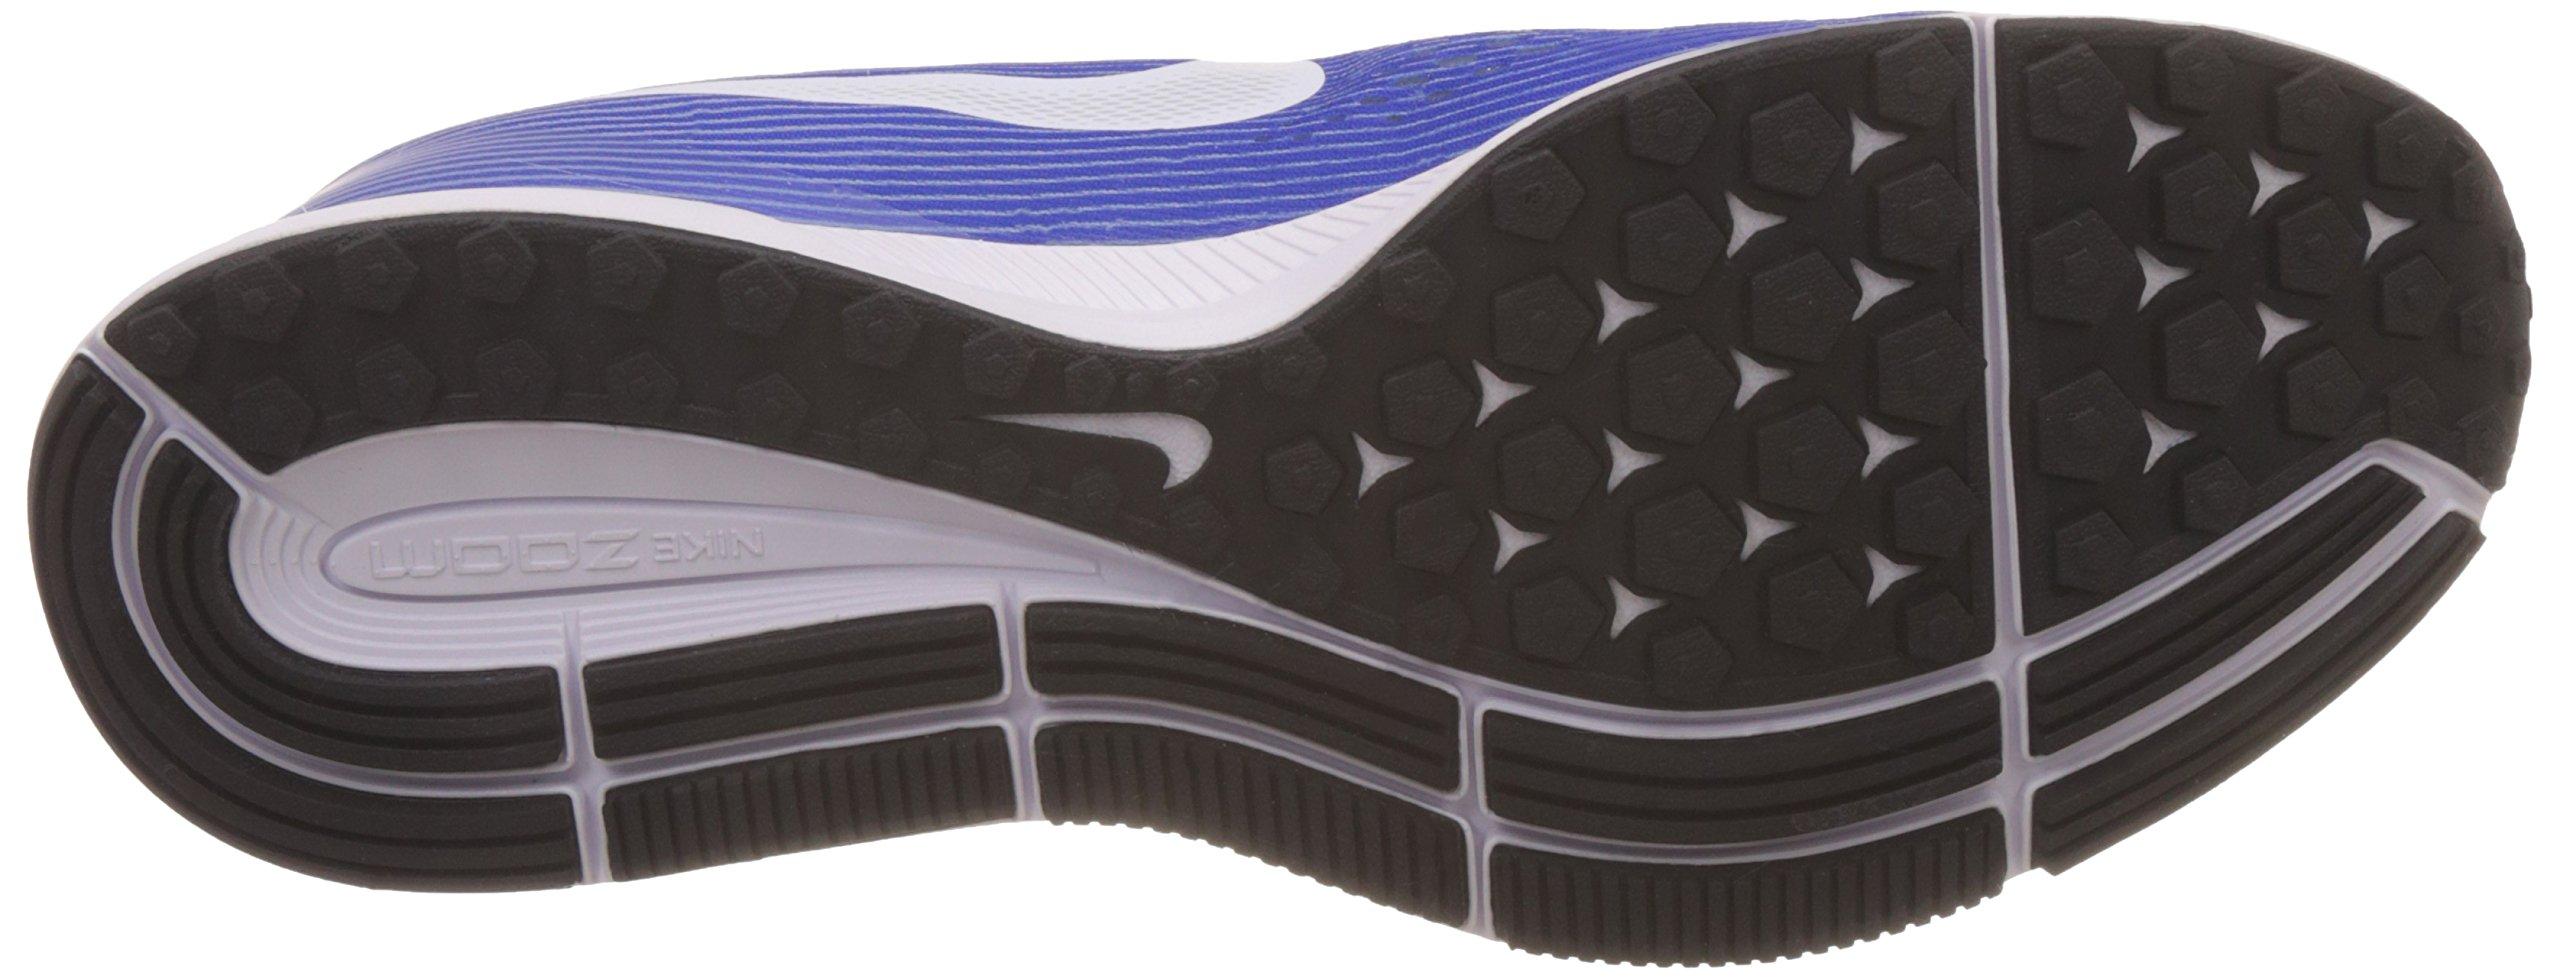 NIKE Mens Air Zoom Pegasus 34 Running Shoe (11 M US, Wolf Grey/White/Racer Blue) by Nike (Image #3)